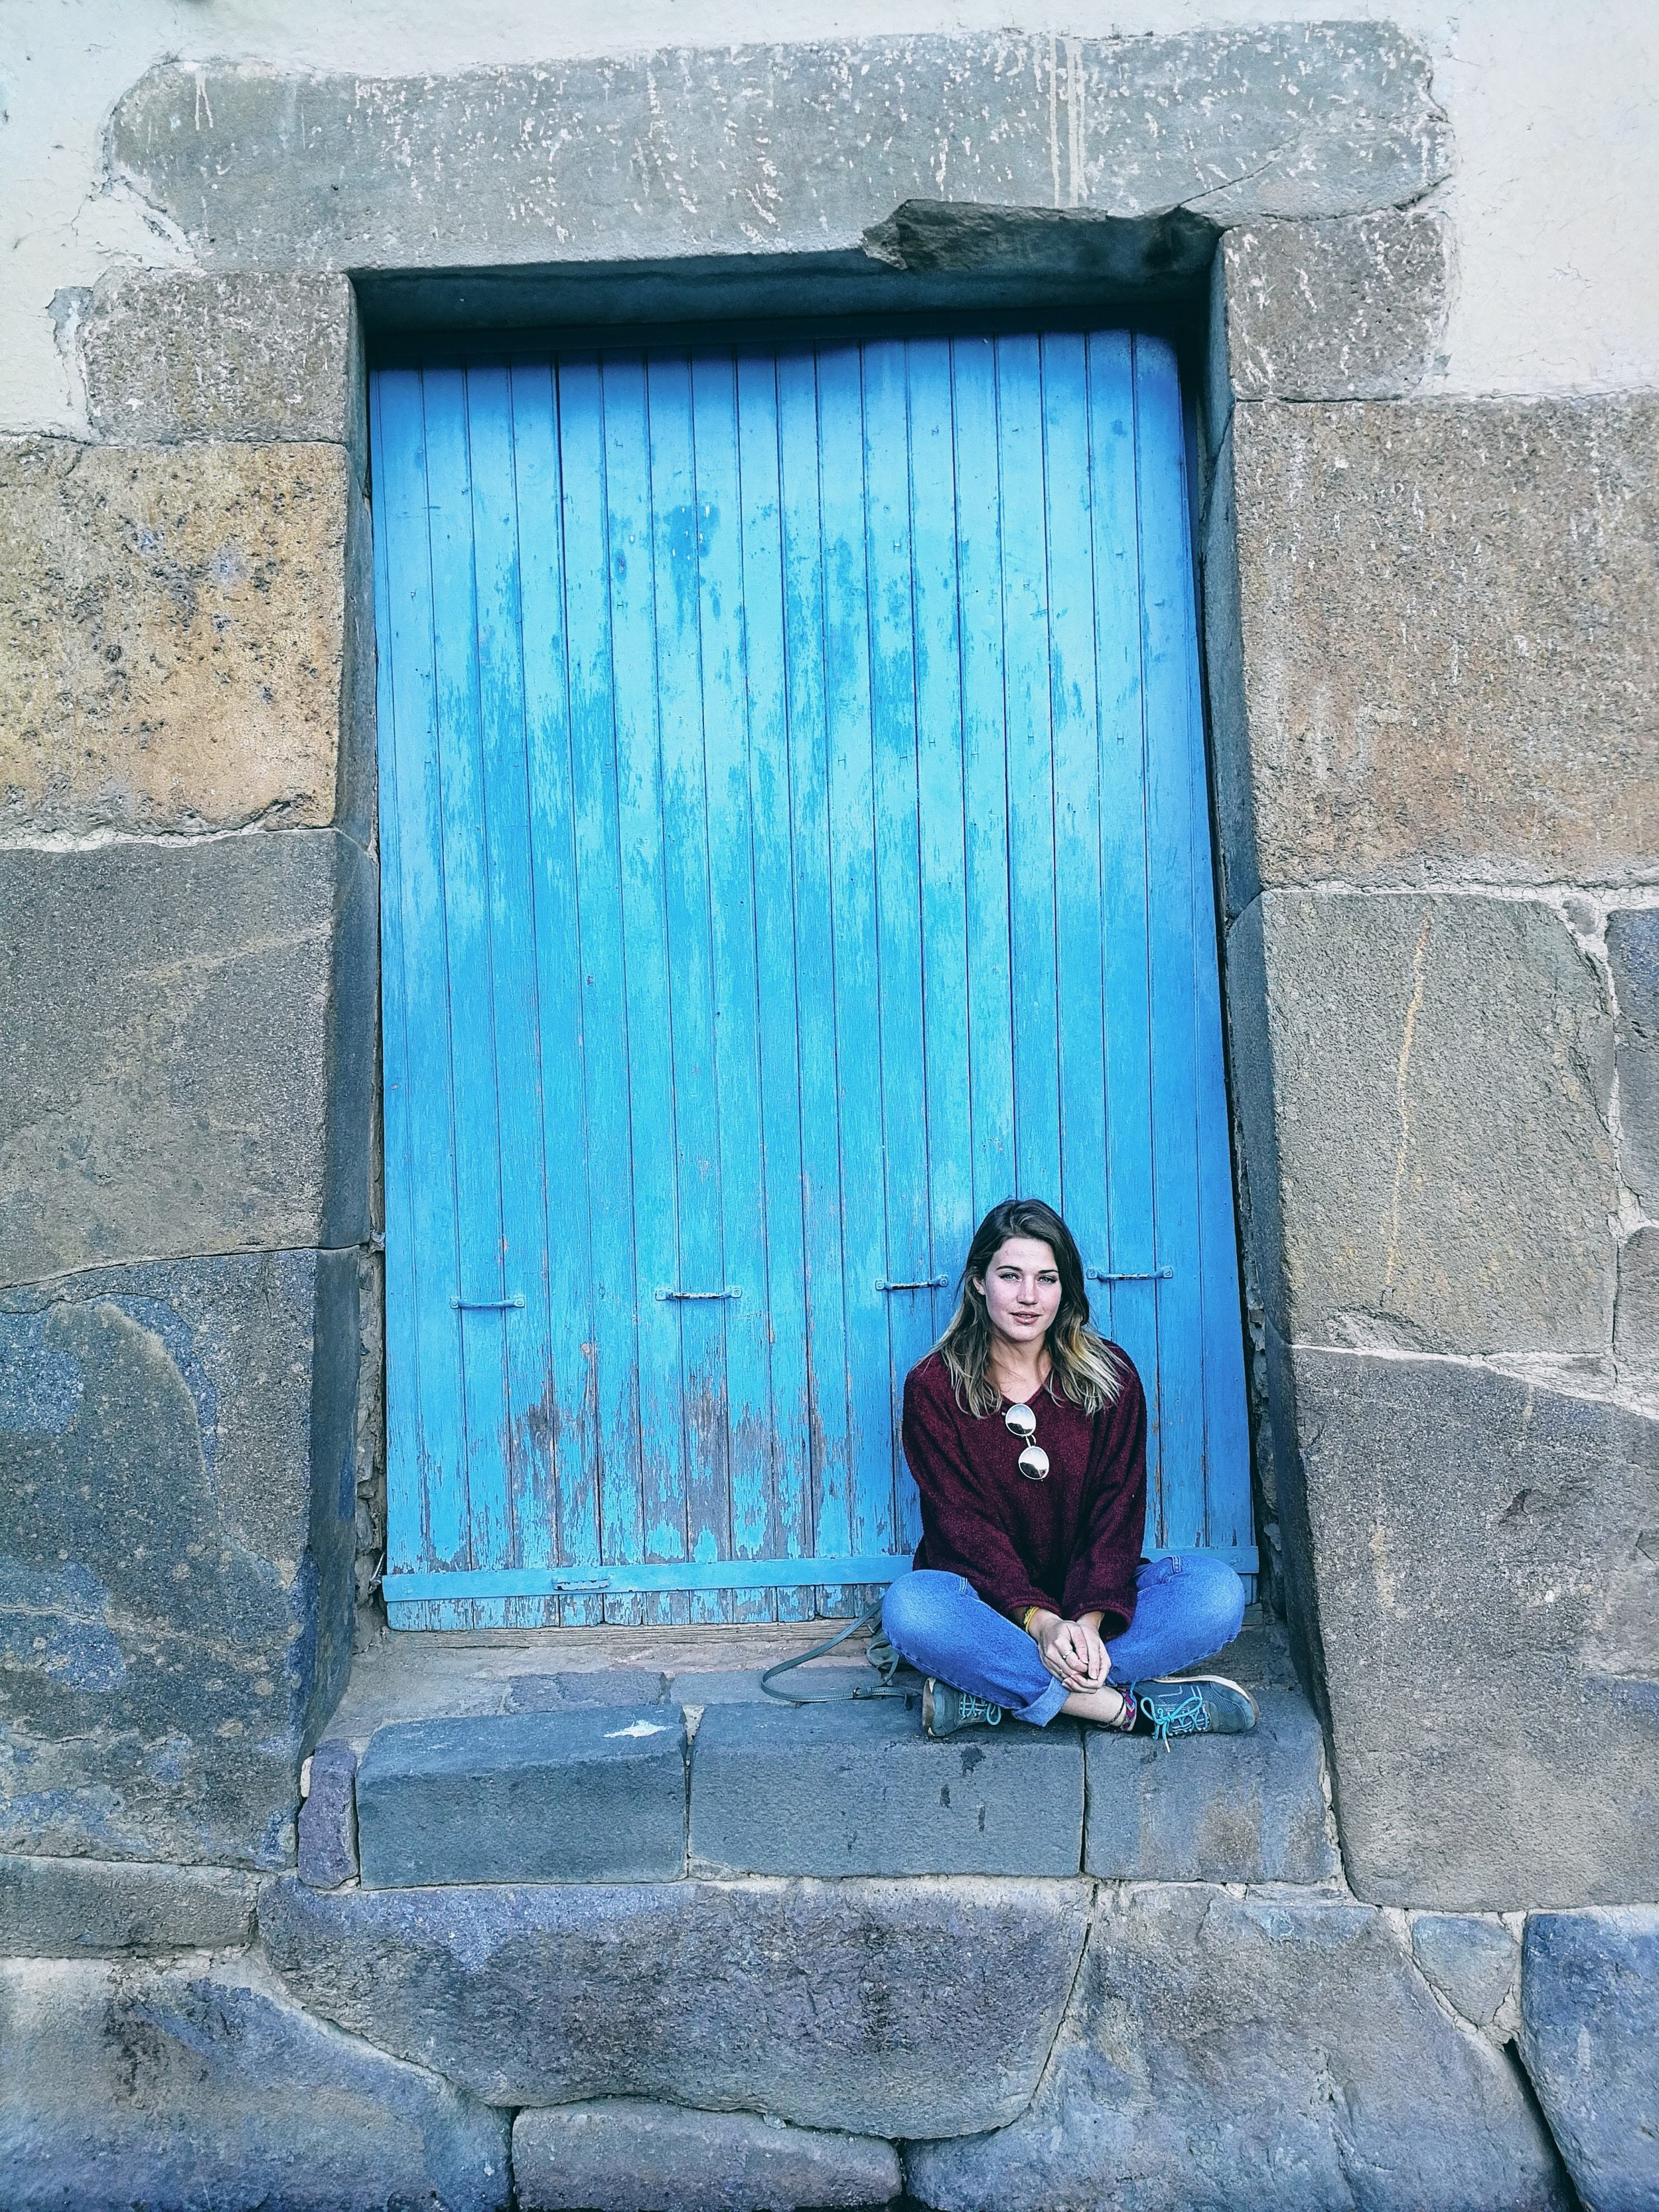 Things to do in Ollantaytambo, Peru. Ollantaytambo is a beautiful inca town on the way to Machu Picchu (Inca Rail) full of ruins. Founder Rose Cornwell 2018